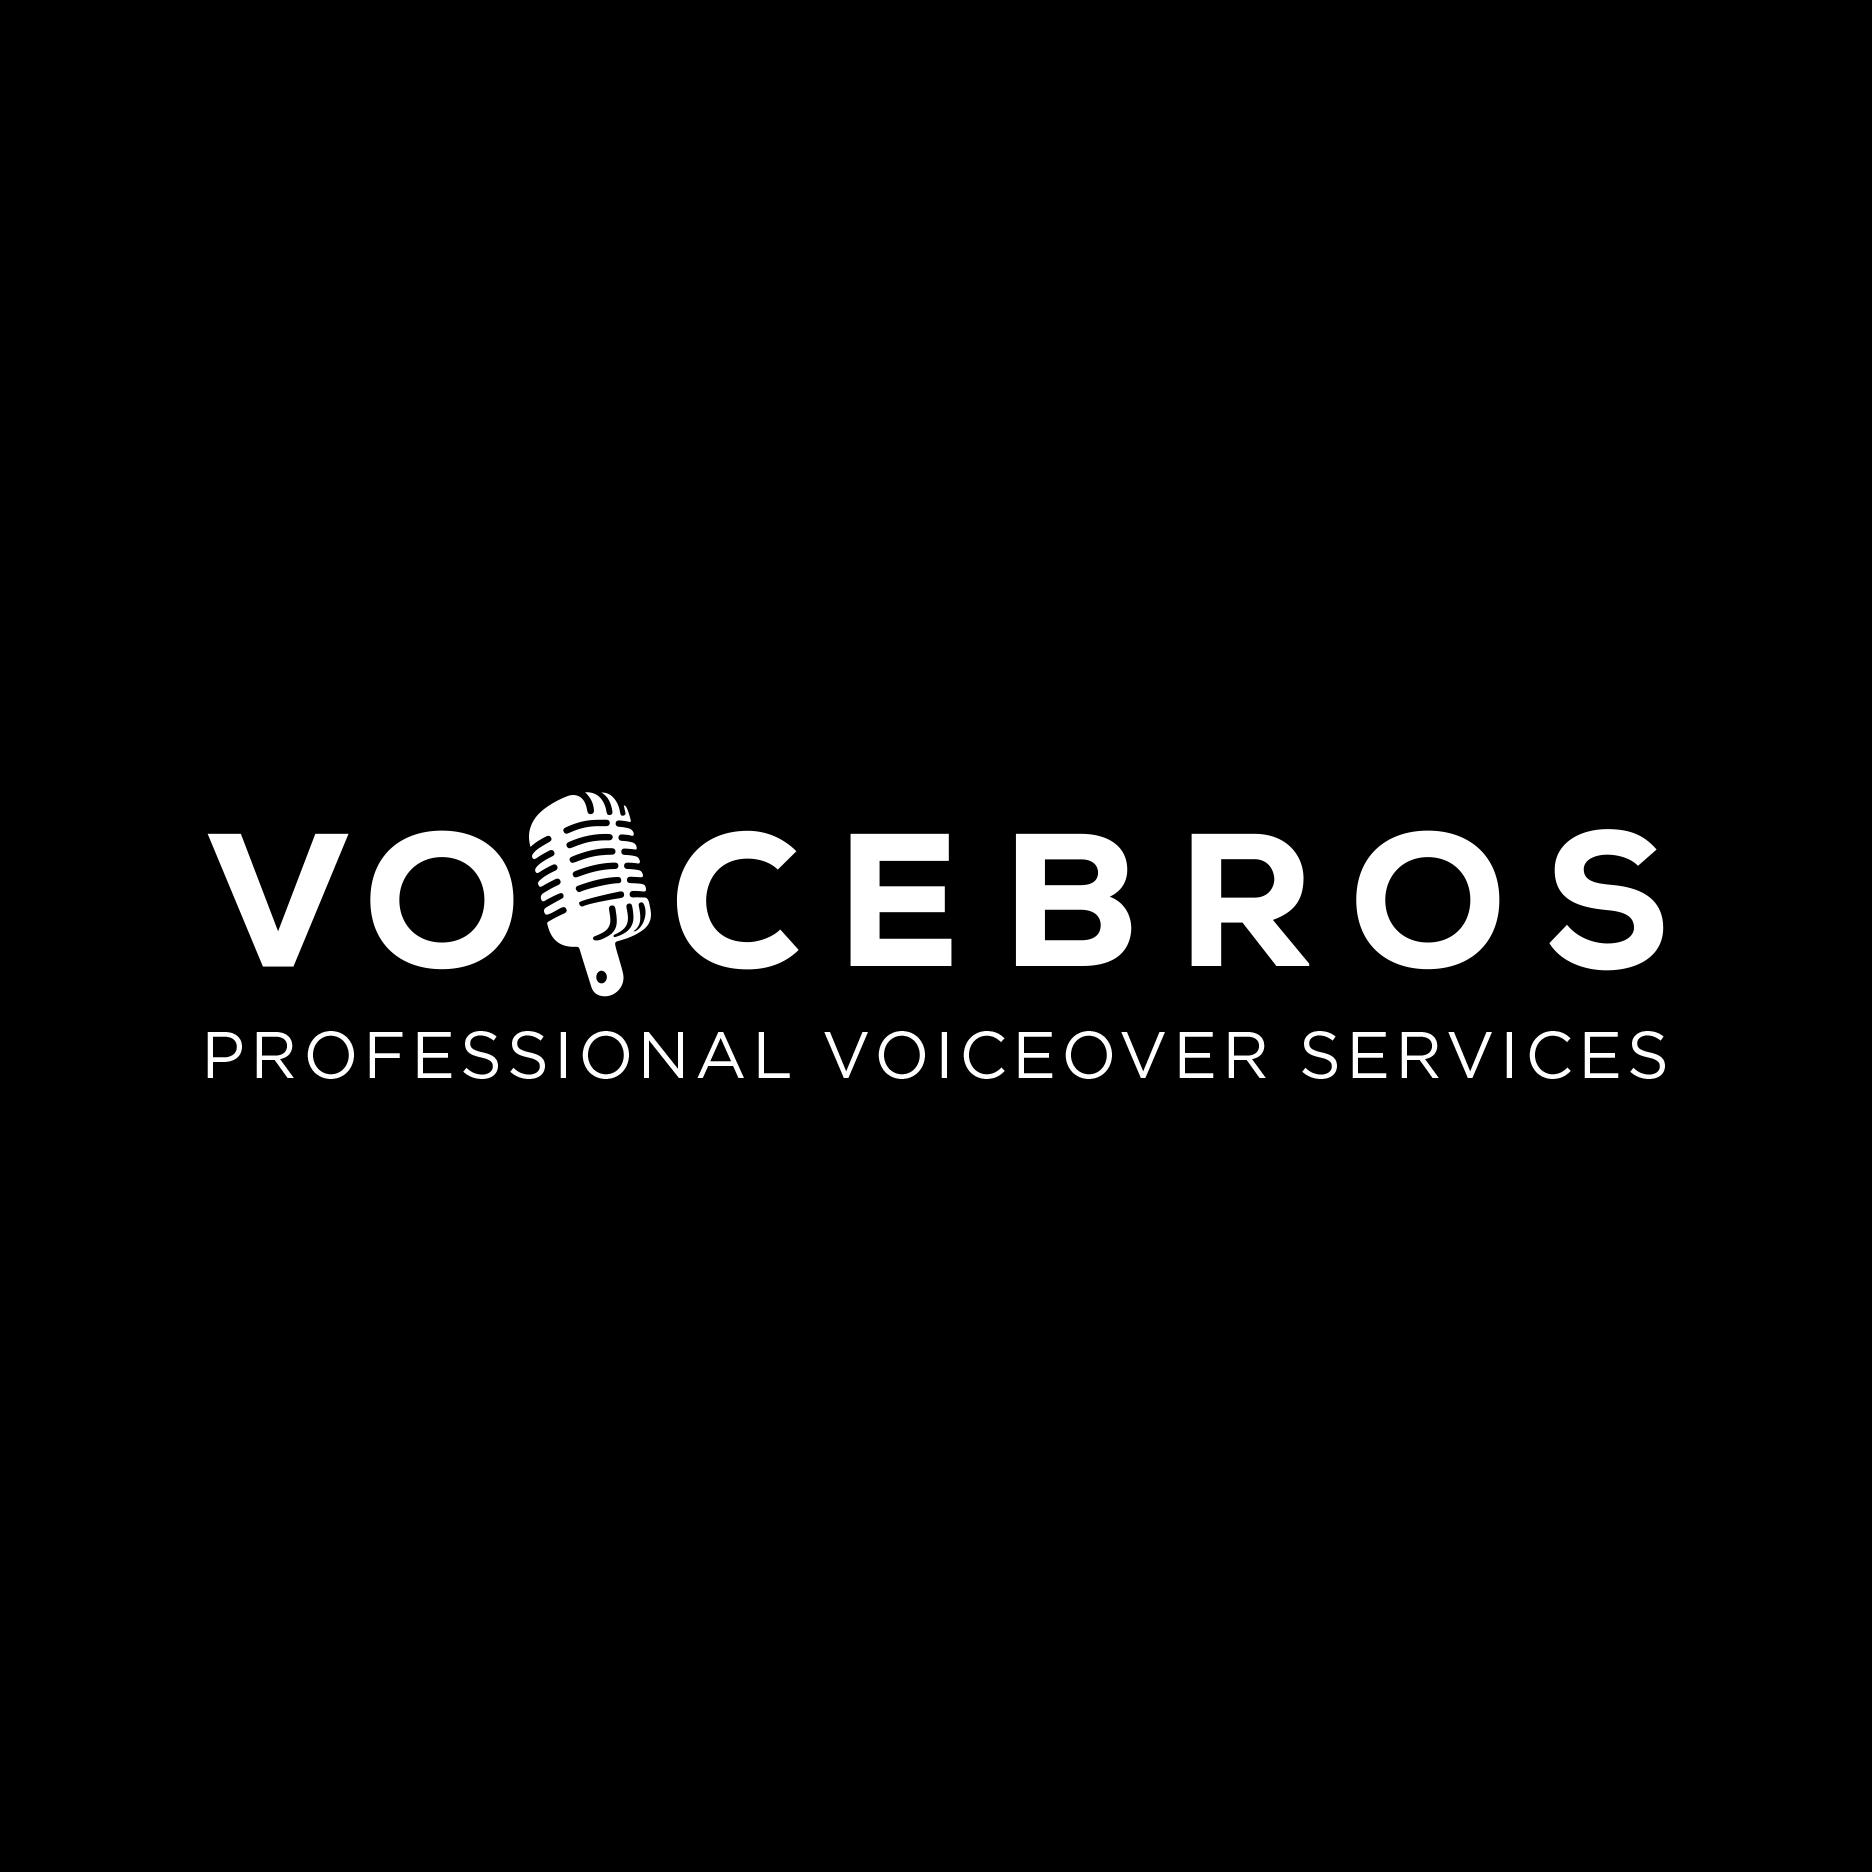 Sneha Adhikari is a voice over actor